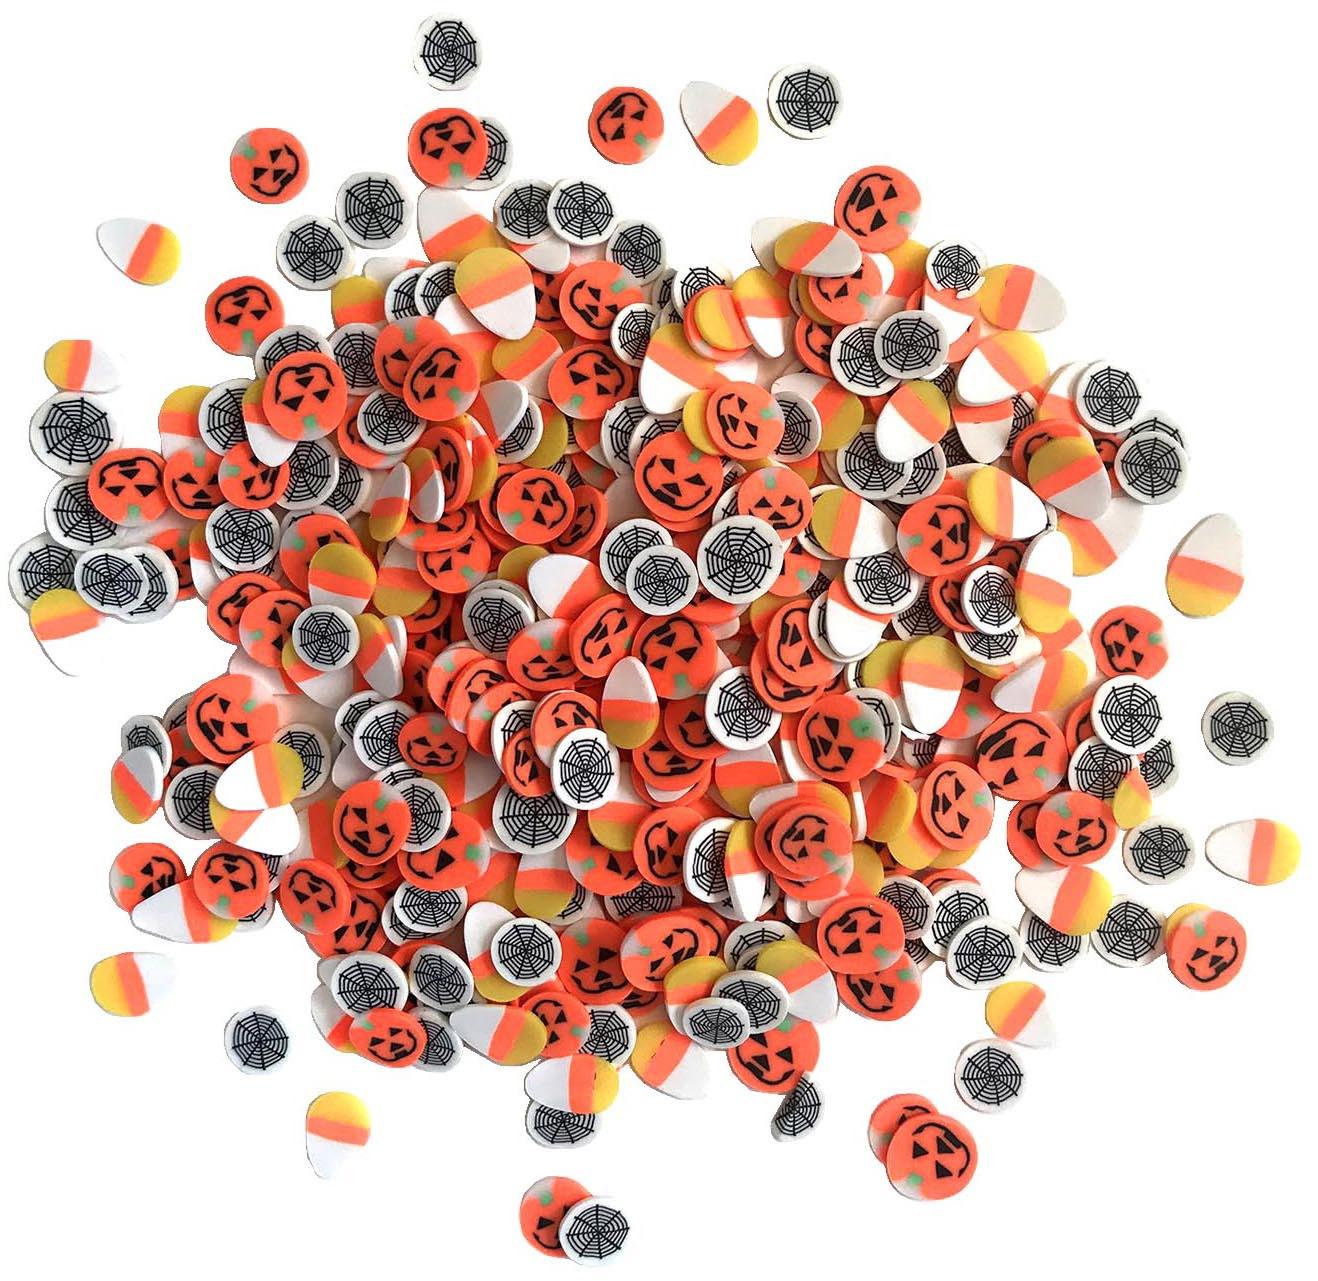 Buttons Galore Sprinkletz Embellishments 12g-October 31st